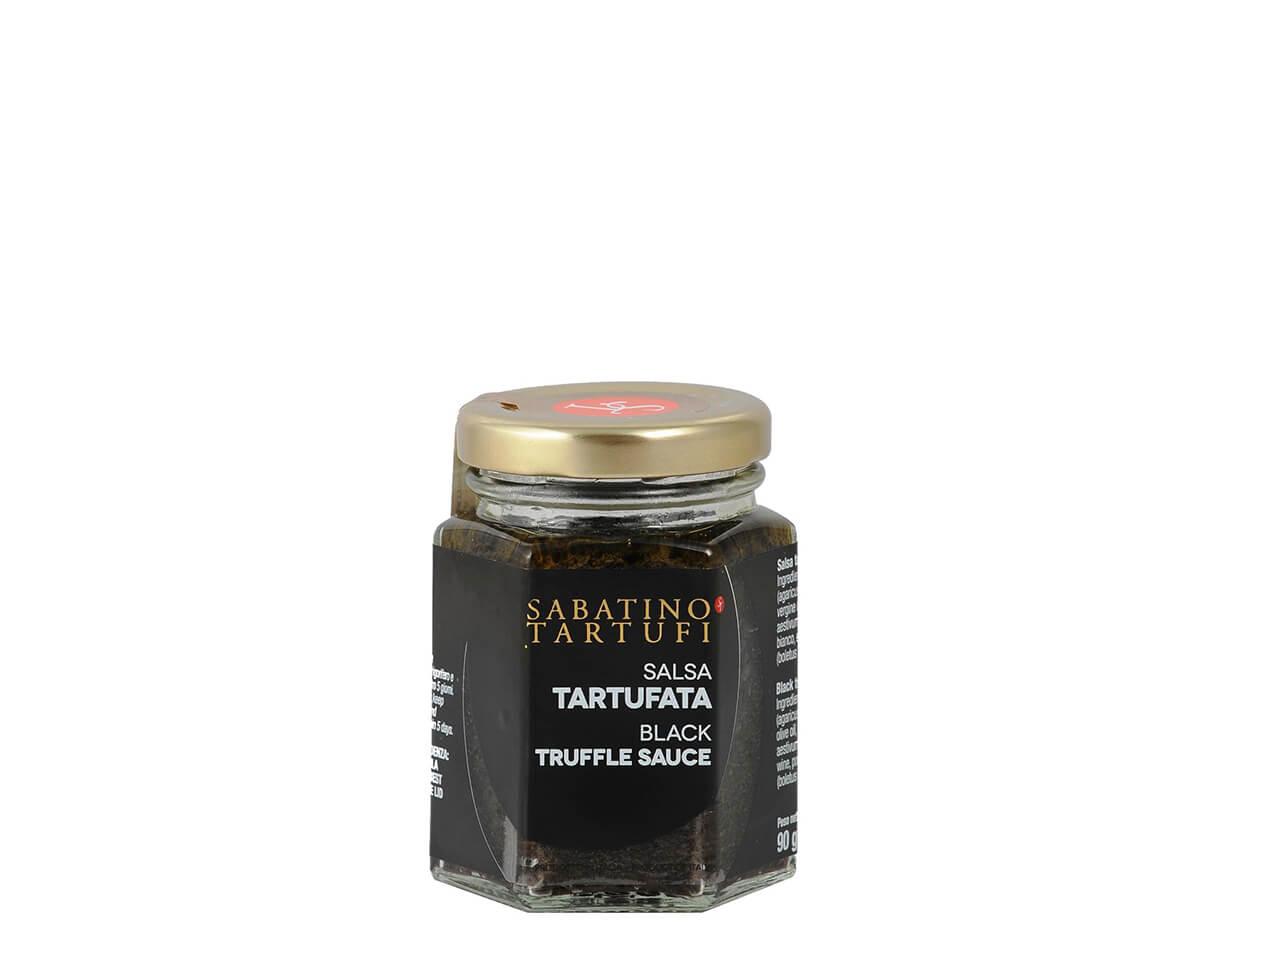 Sabatino Black Truffle Sauce 90gm